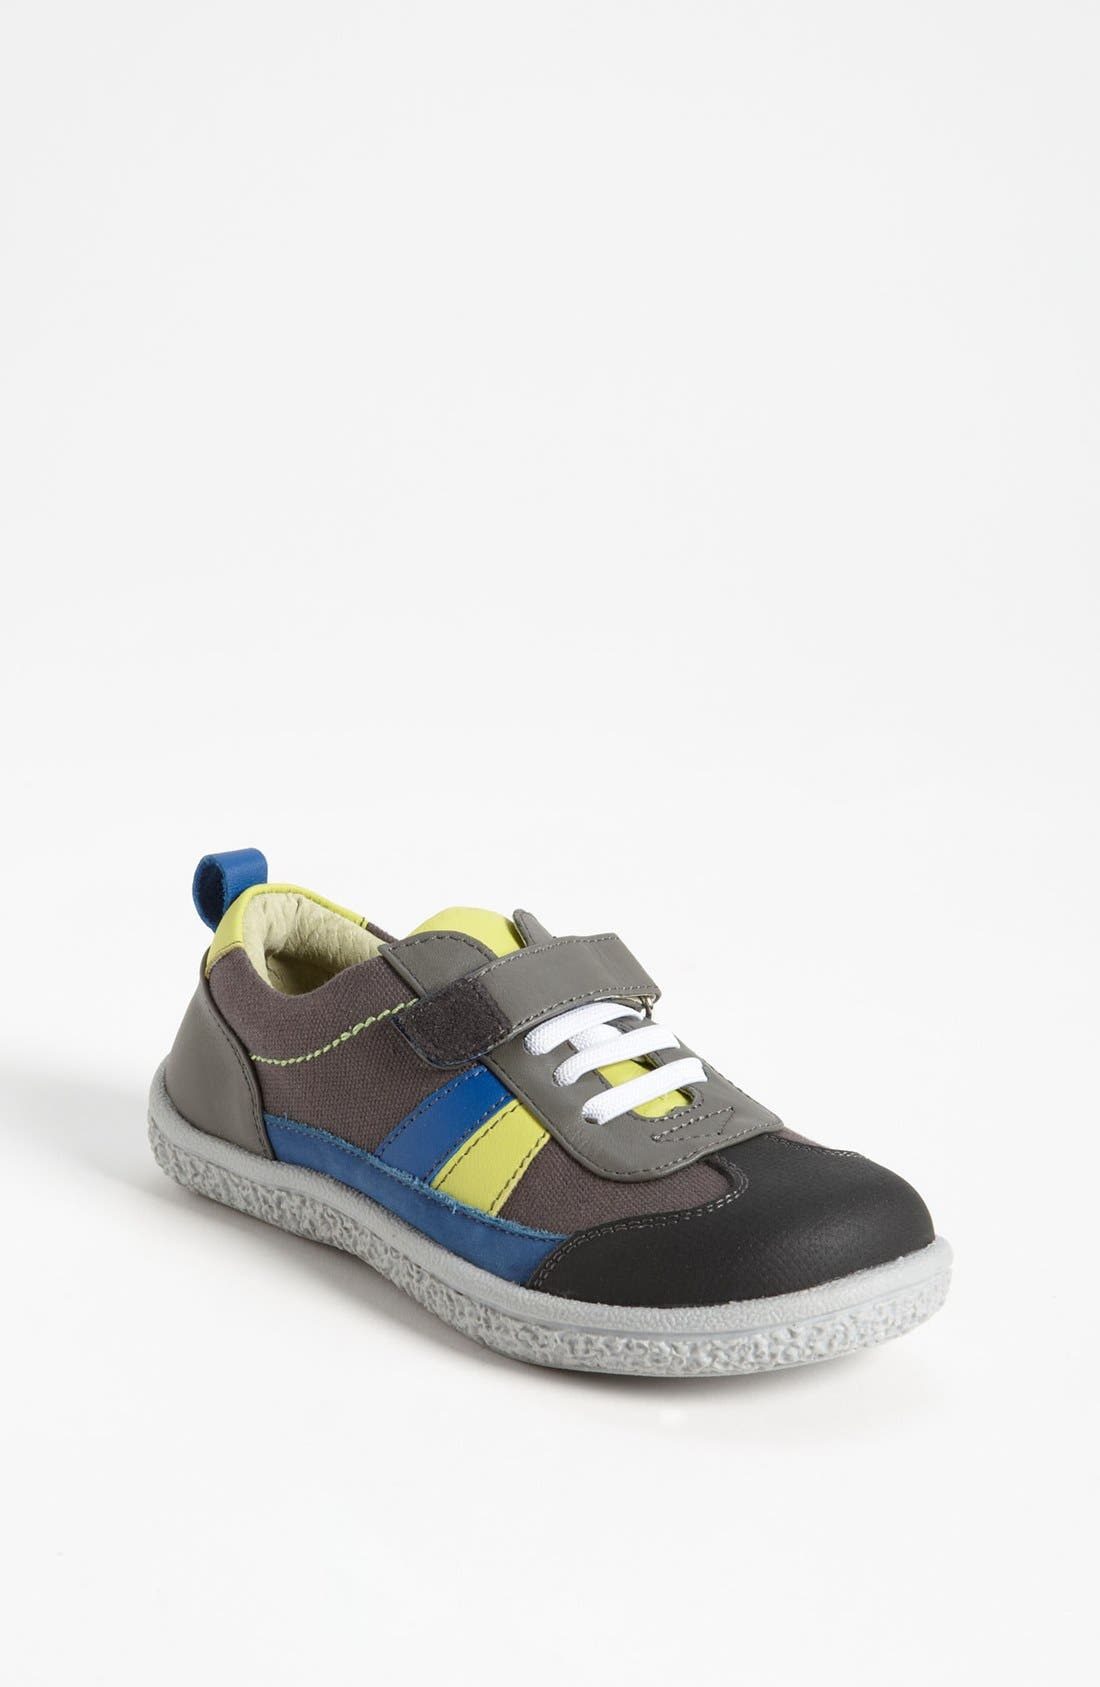 Main Image - See Kai Run 'Enzo' Sneaker (Toddler & Little Kid)